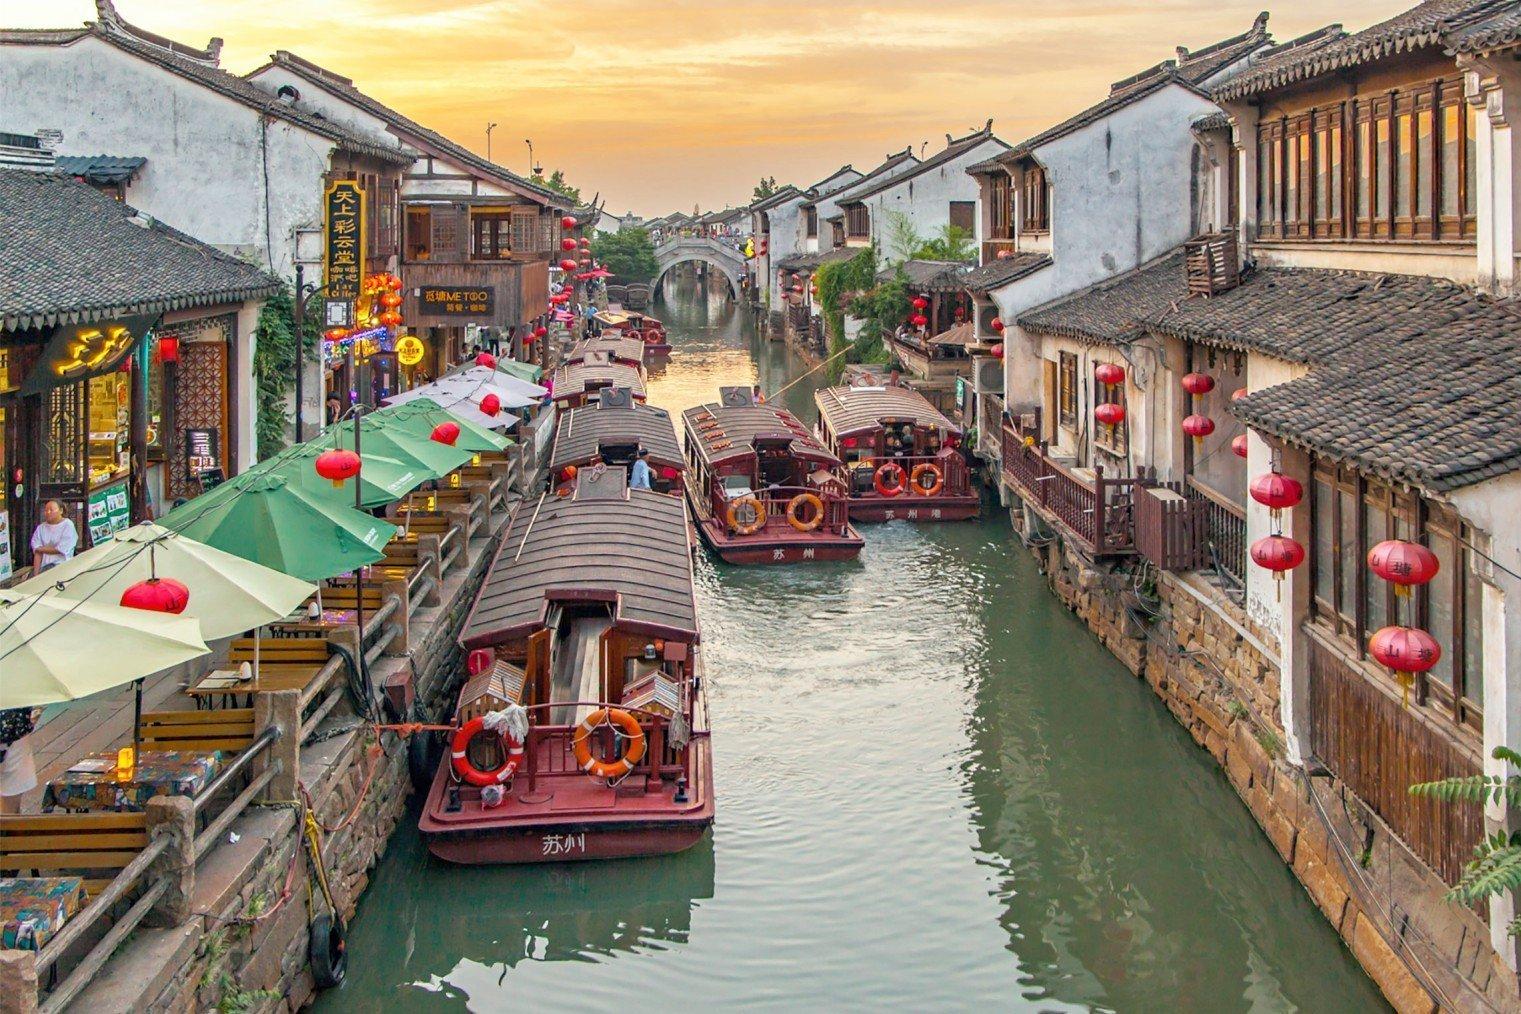 Сучжоу, Китай. Suzhou (Soochow), China